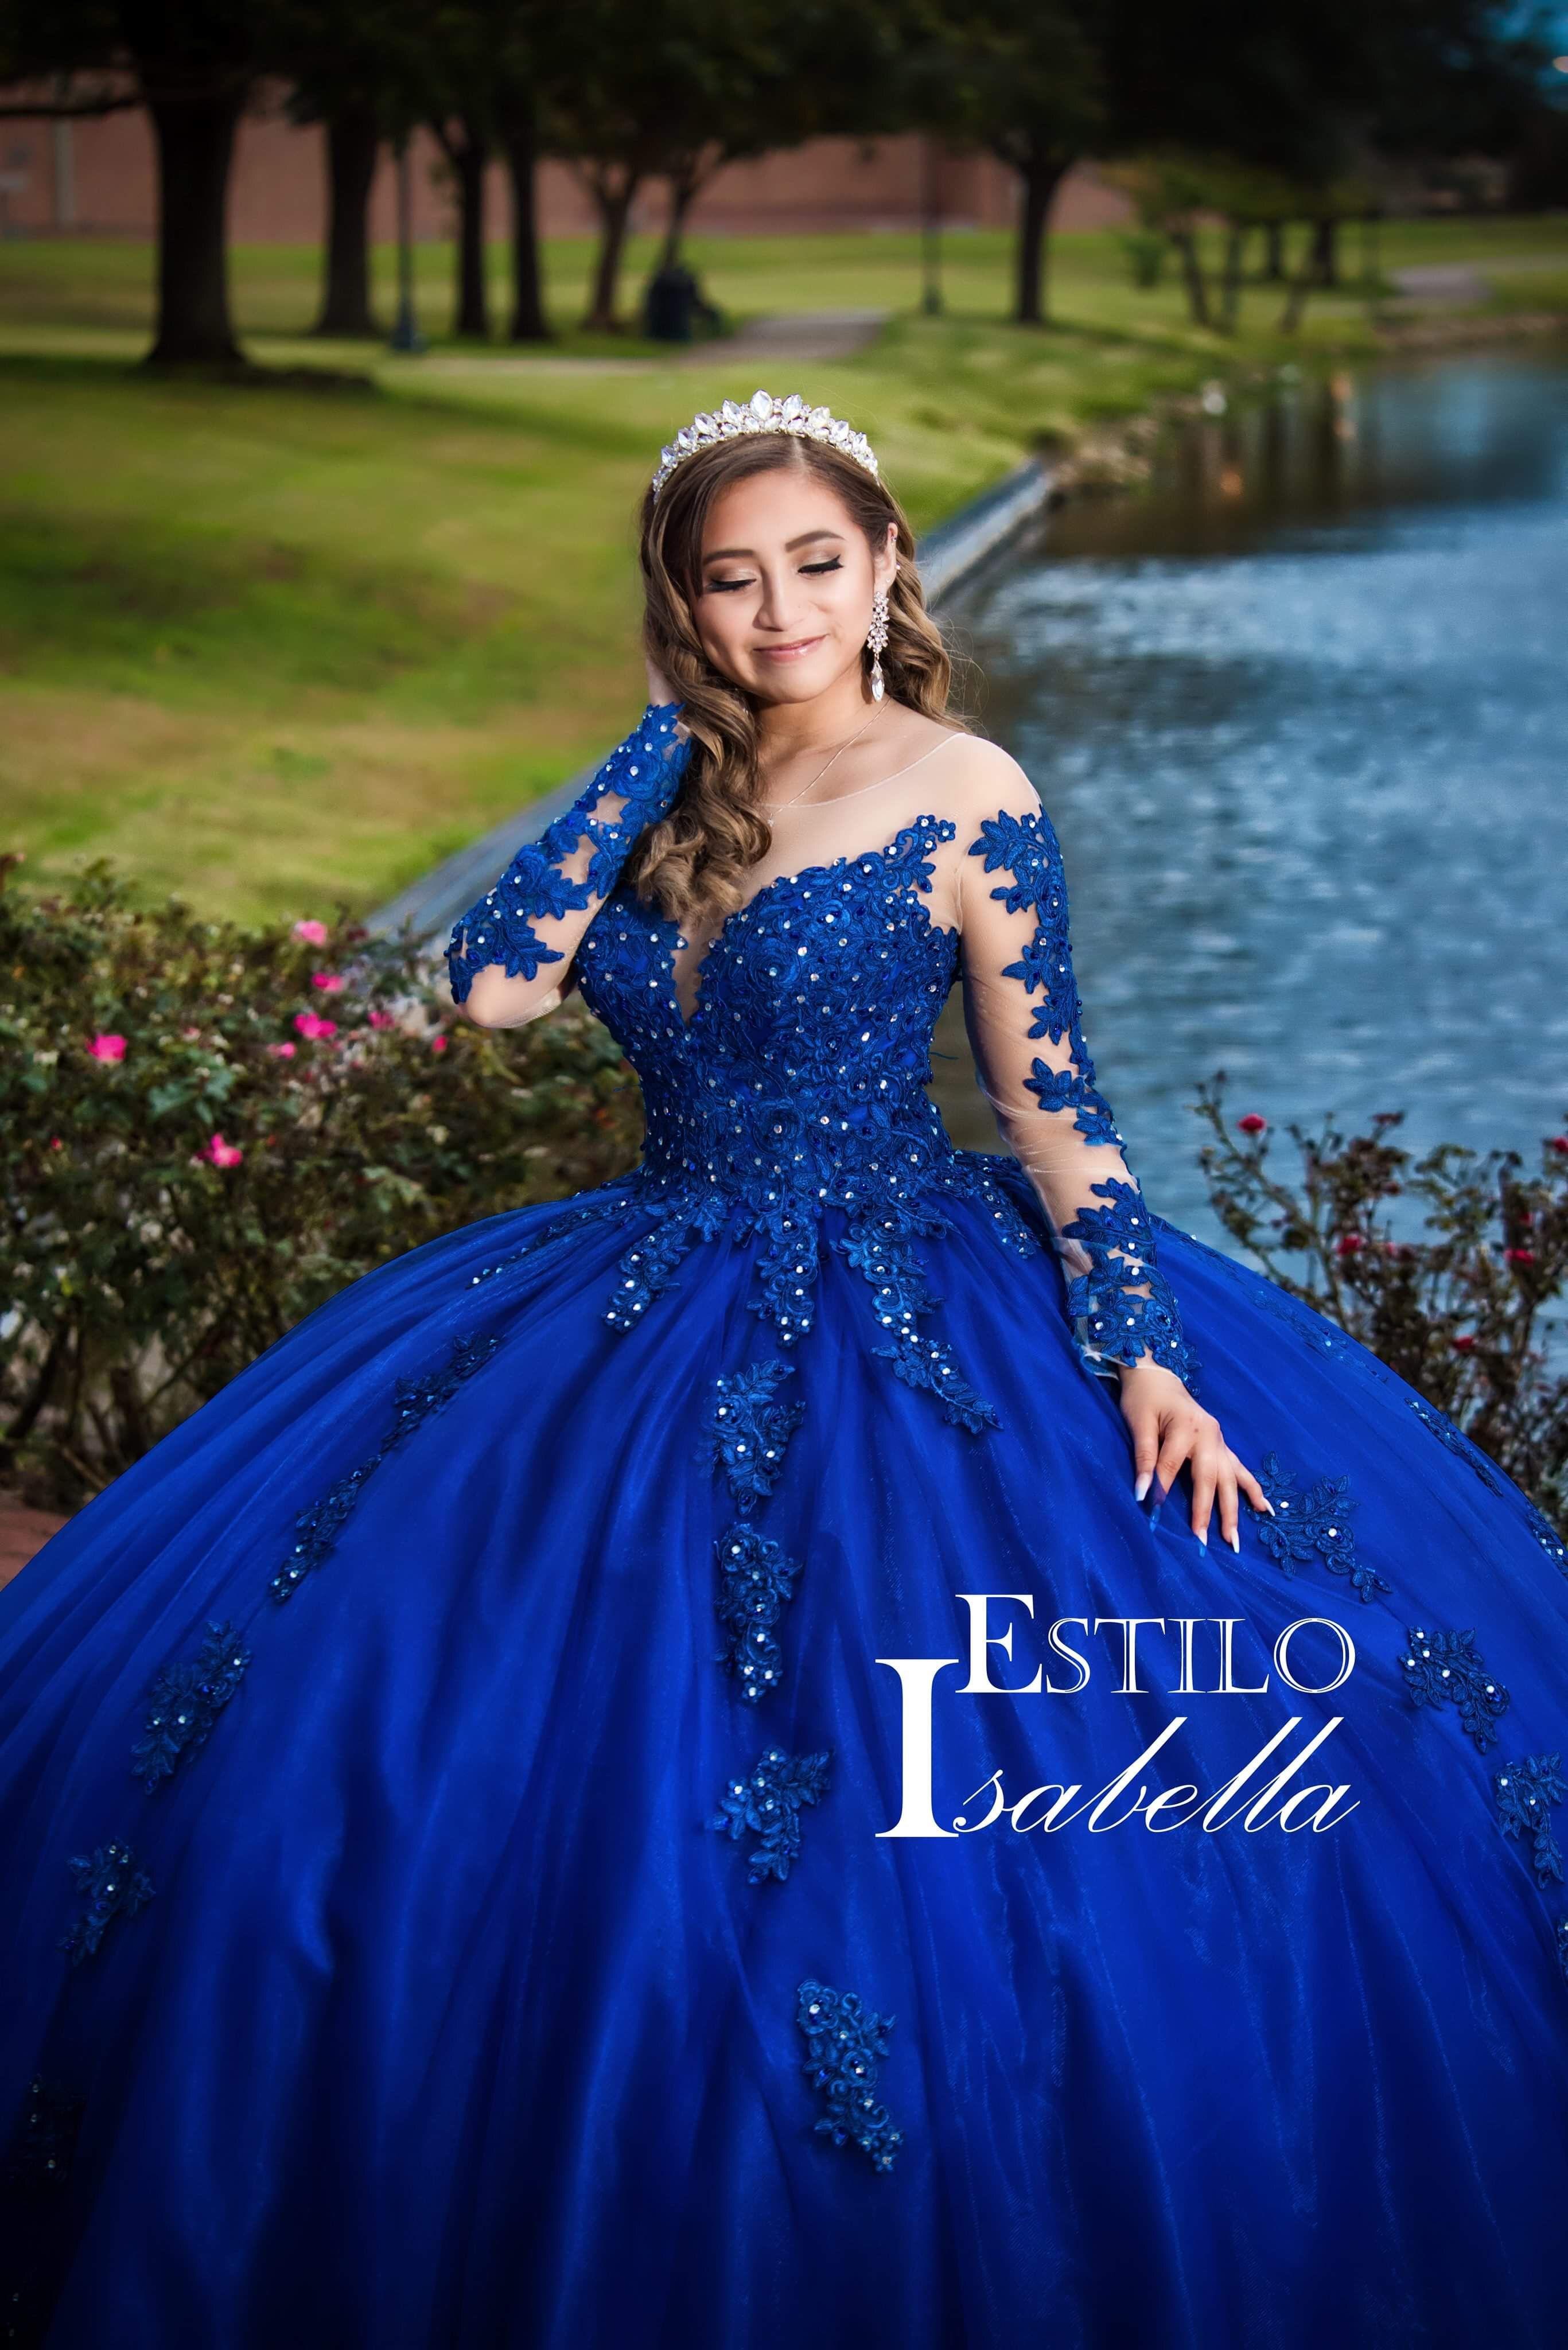 Pin By Estilo Isabella On Vip Customers Dress Quince Dresses Quince Dresses Mexican Mexican Quinceanera Dresses [ 4096 x 2733 Pixel ]